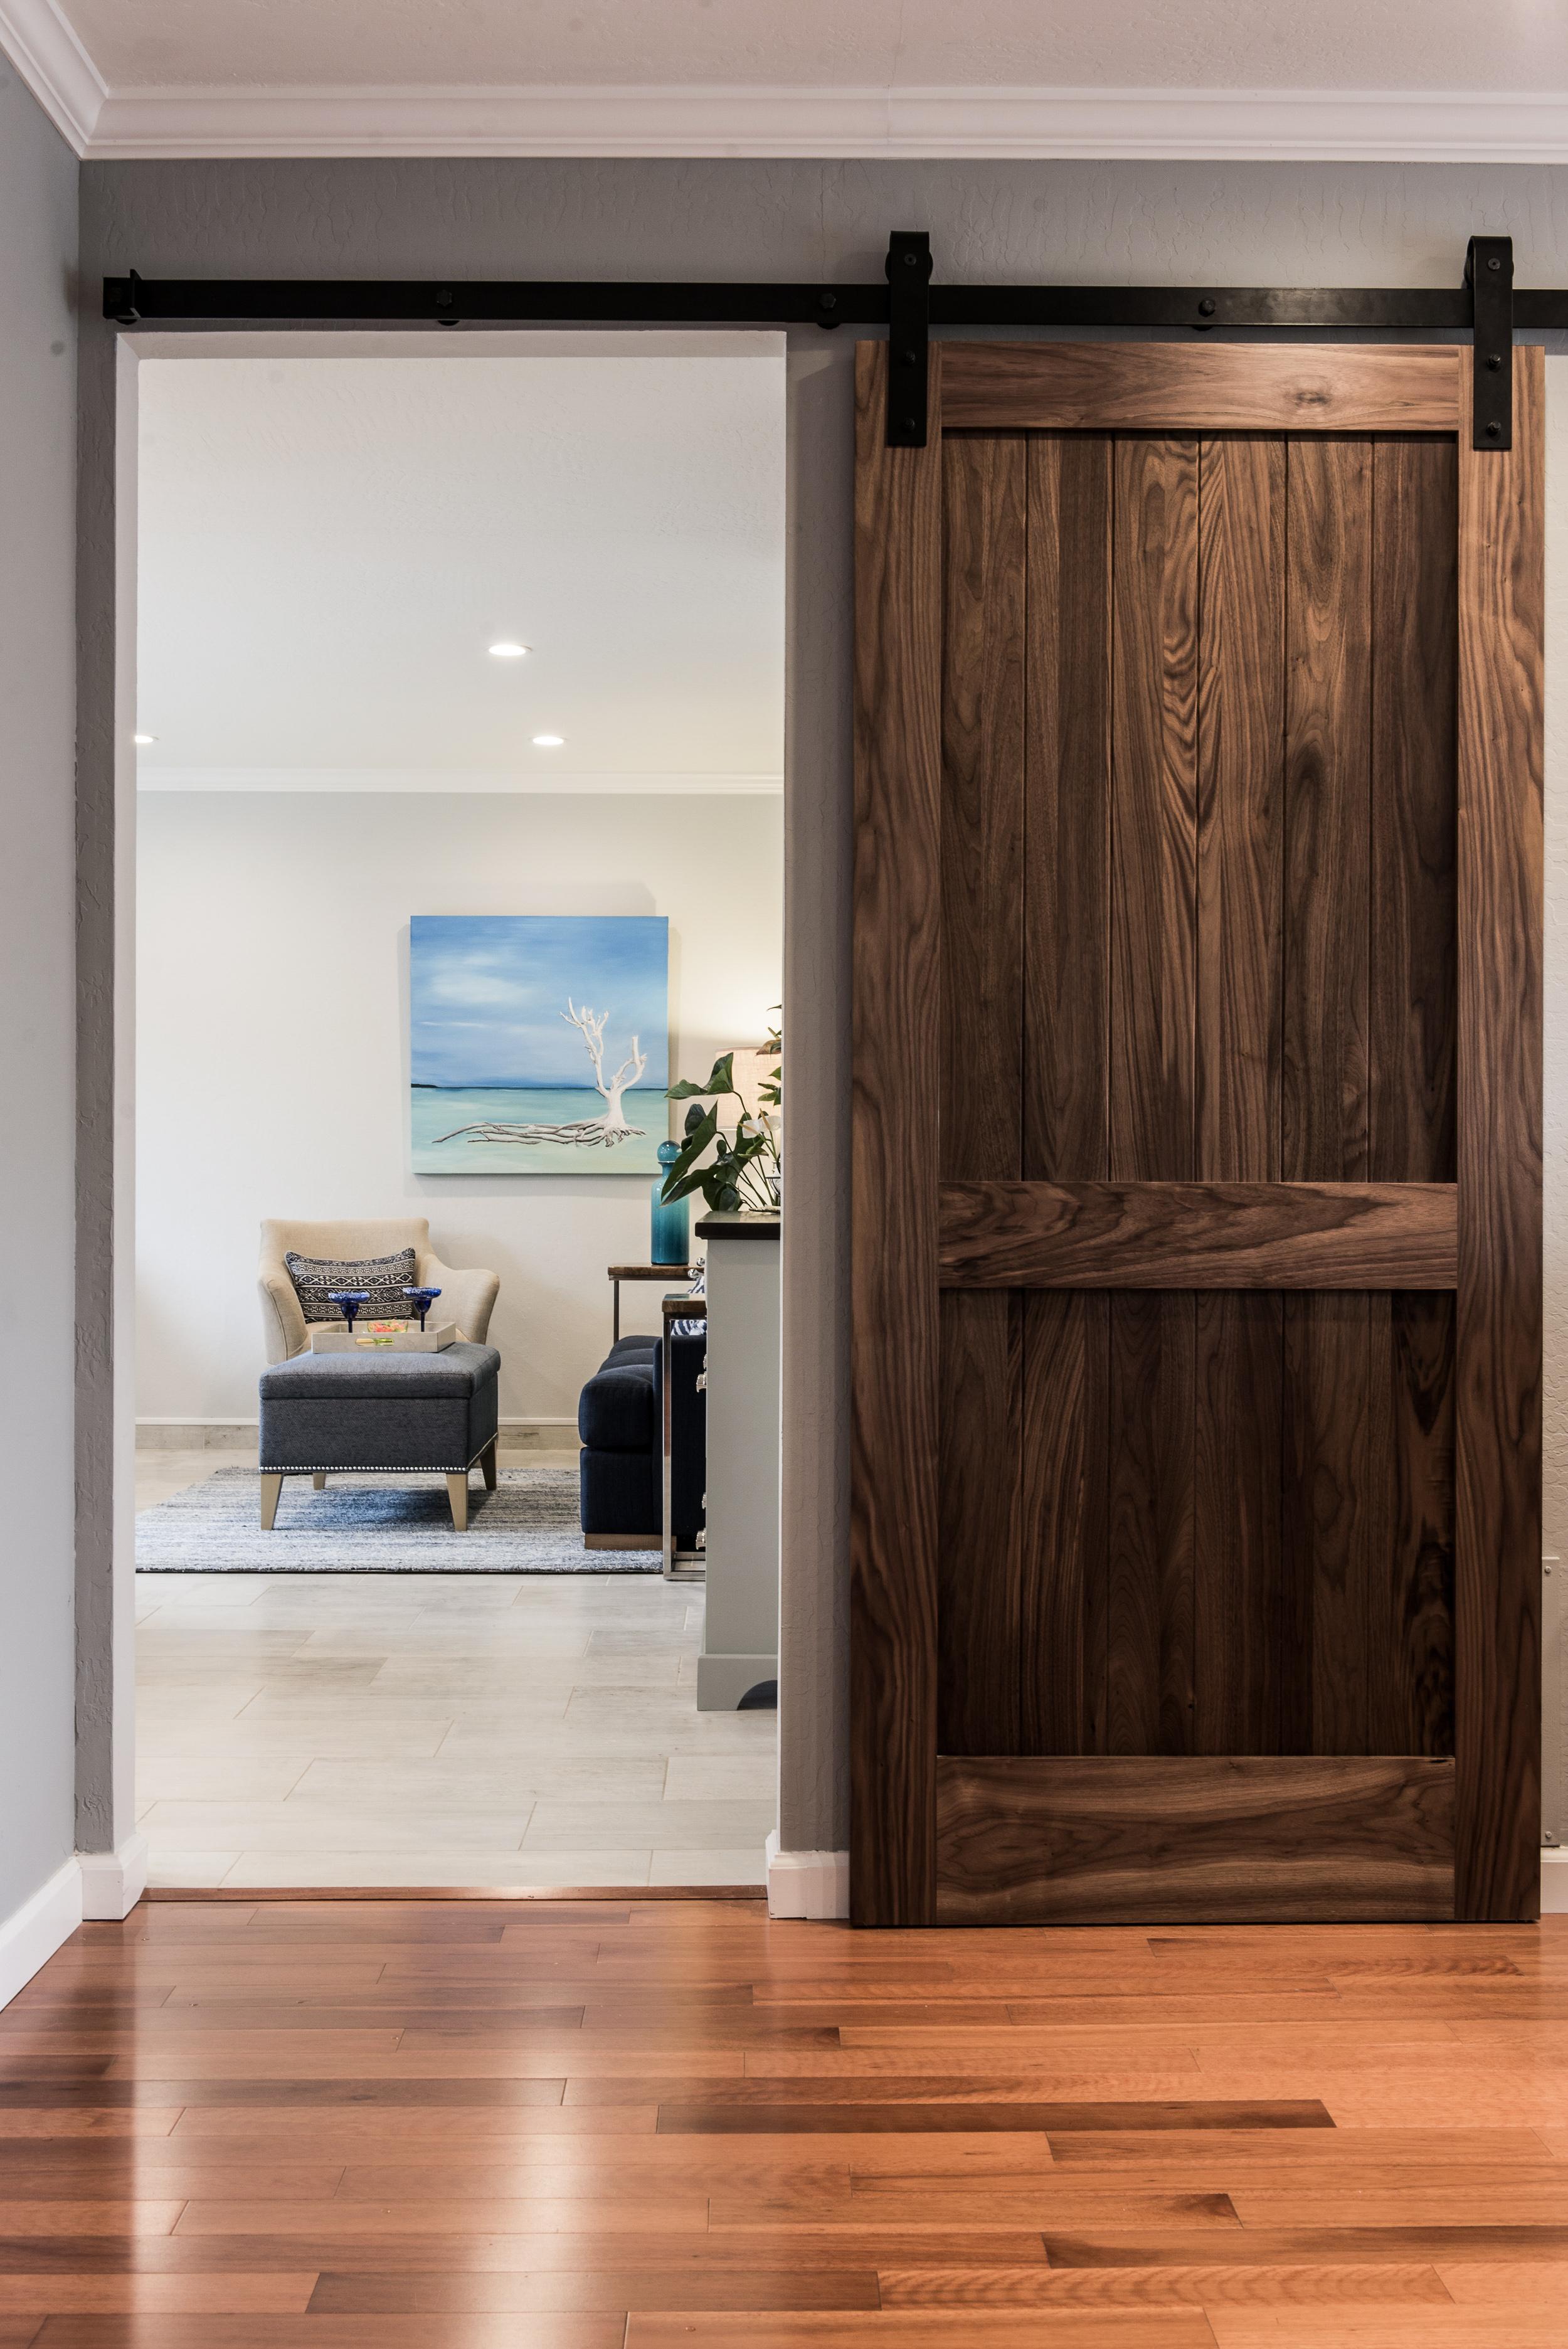 Tropical Beach Bungalow Interior Design interiorstyle